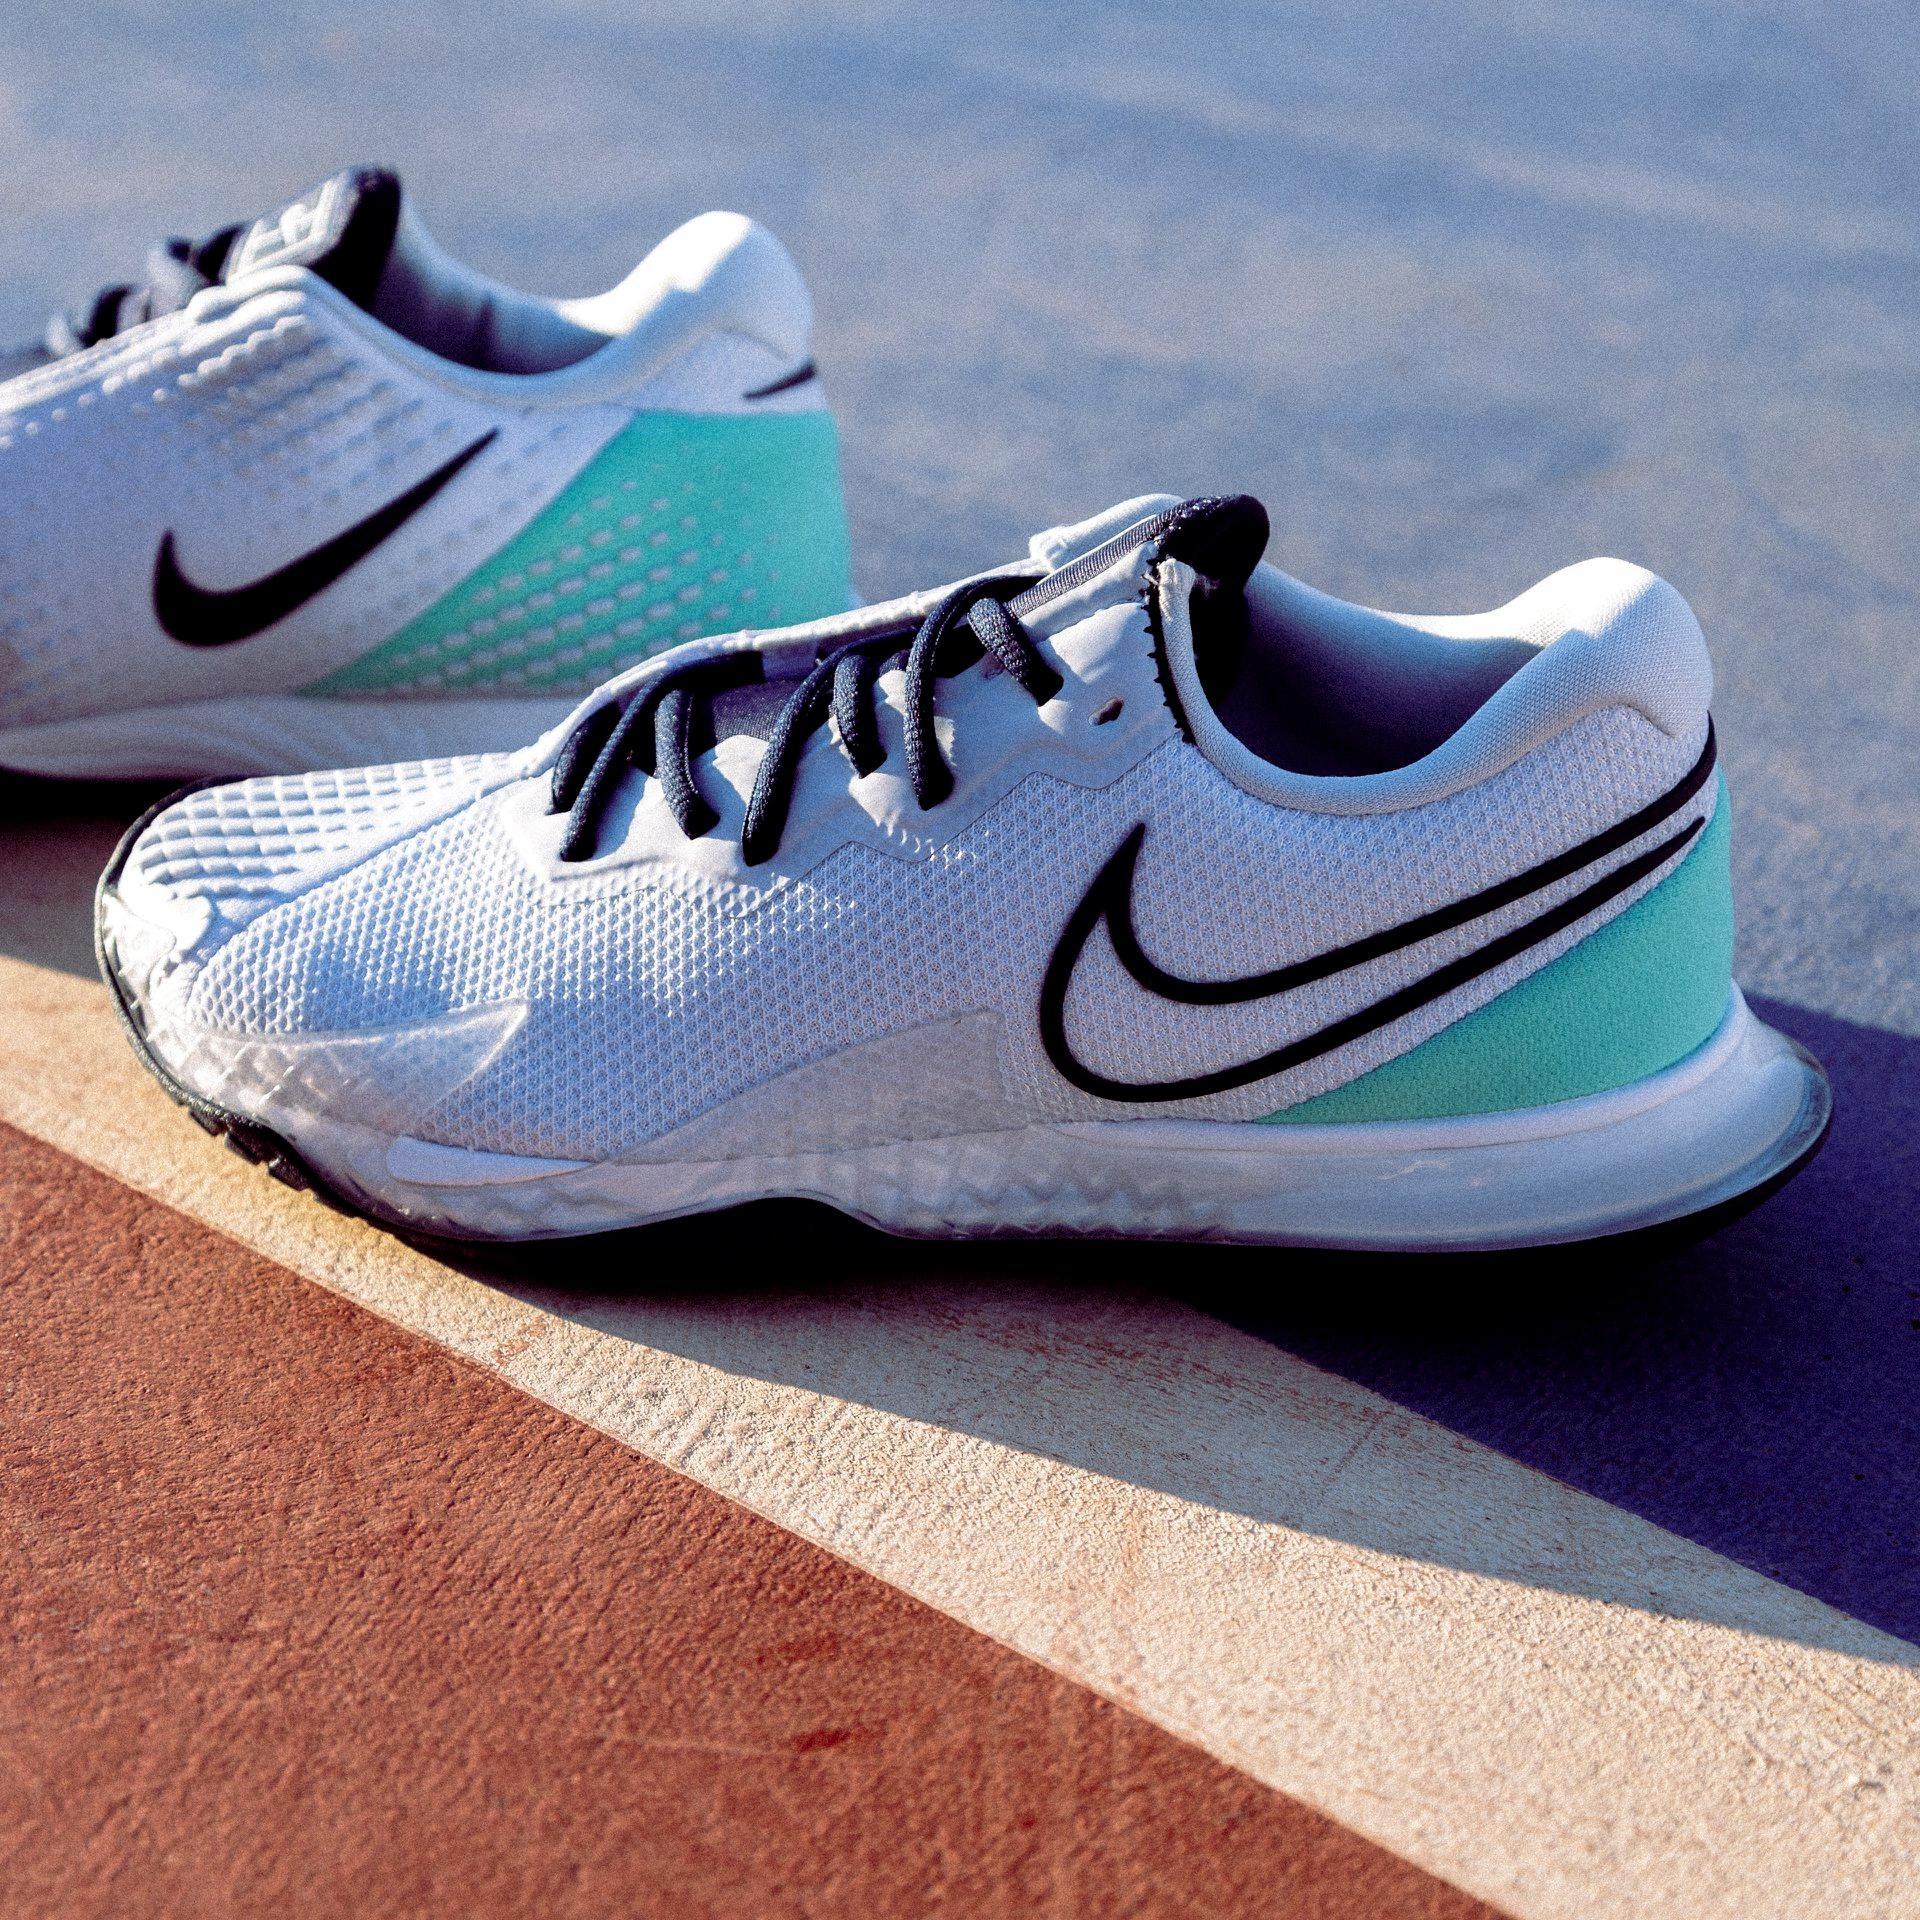 Nike Air Zoom Vapor Cage 4 Clay - Football Grey/Midnight Navy